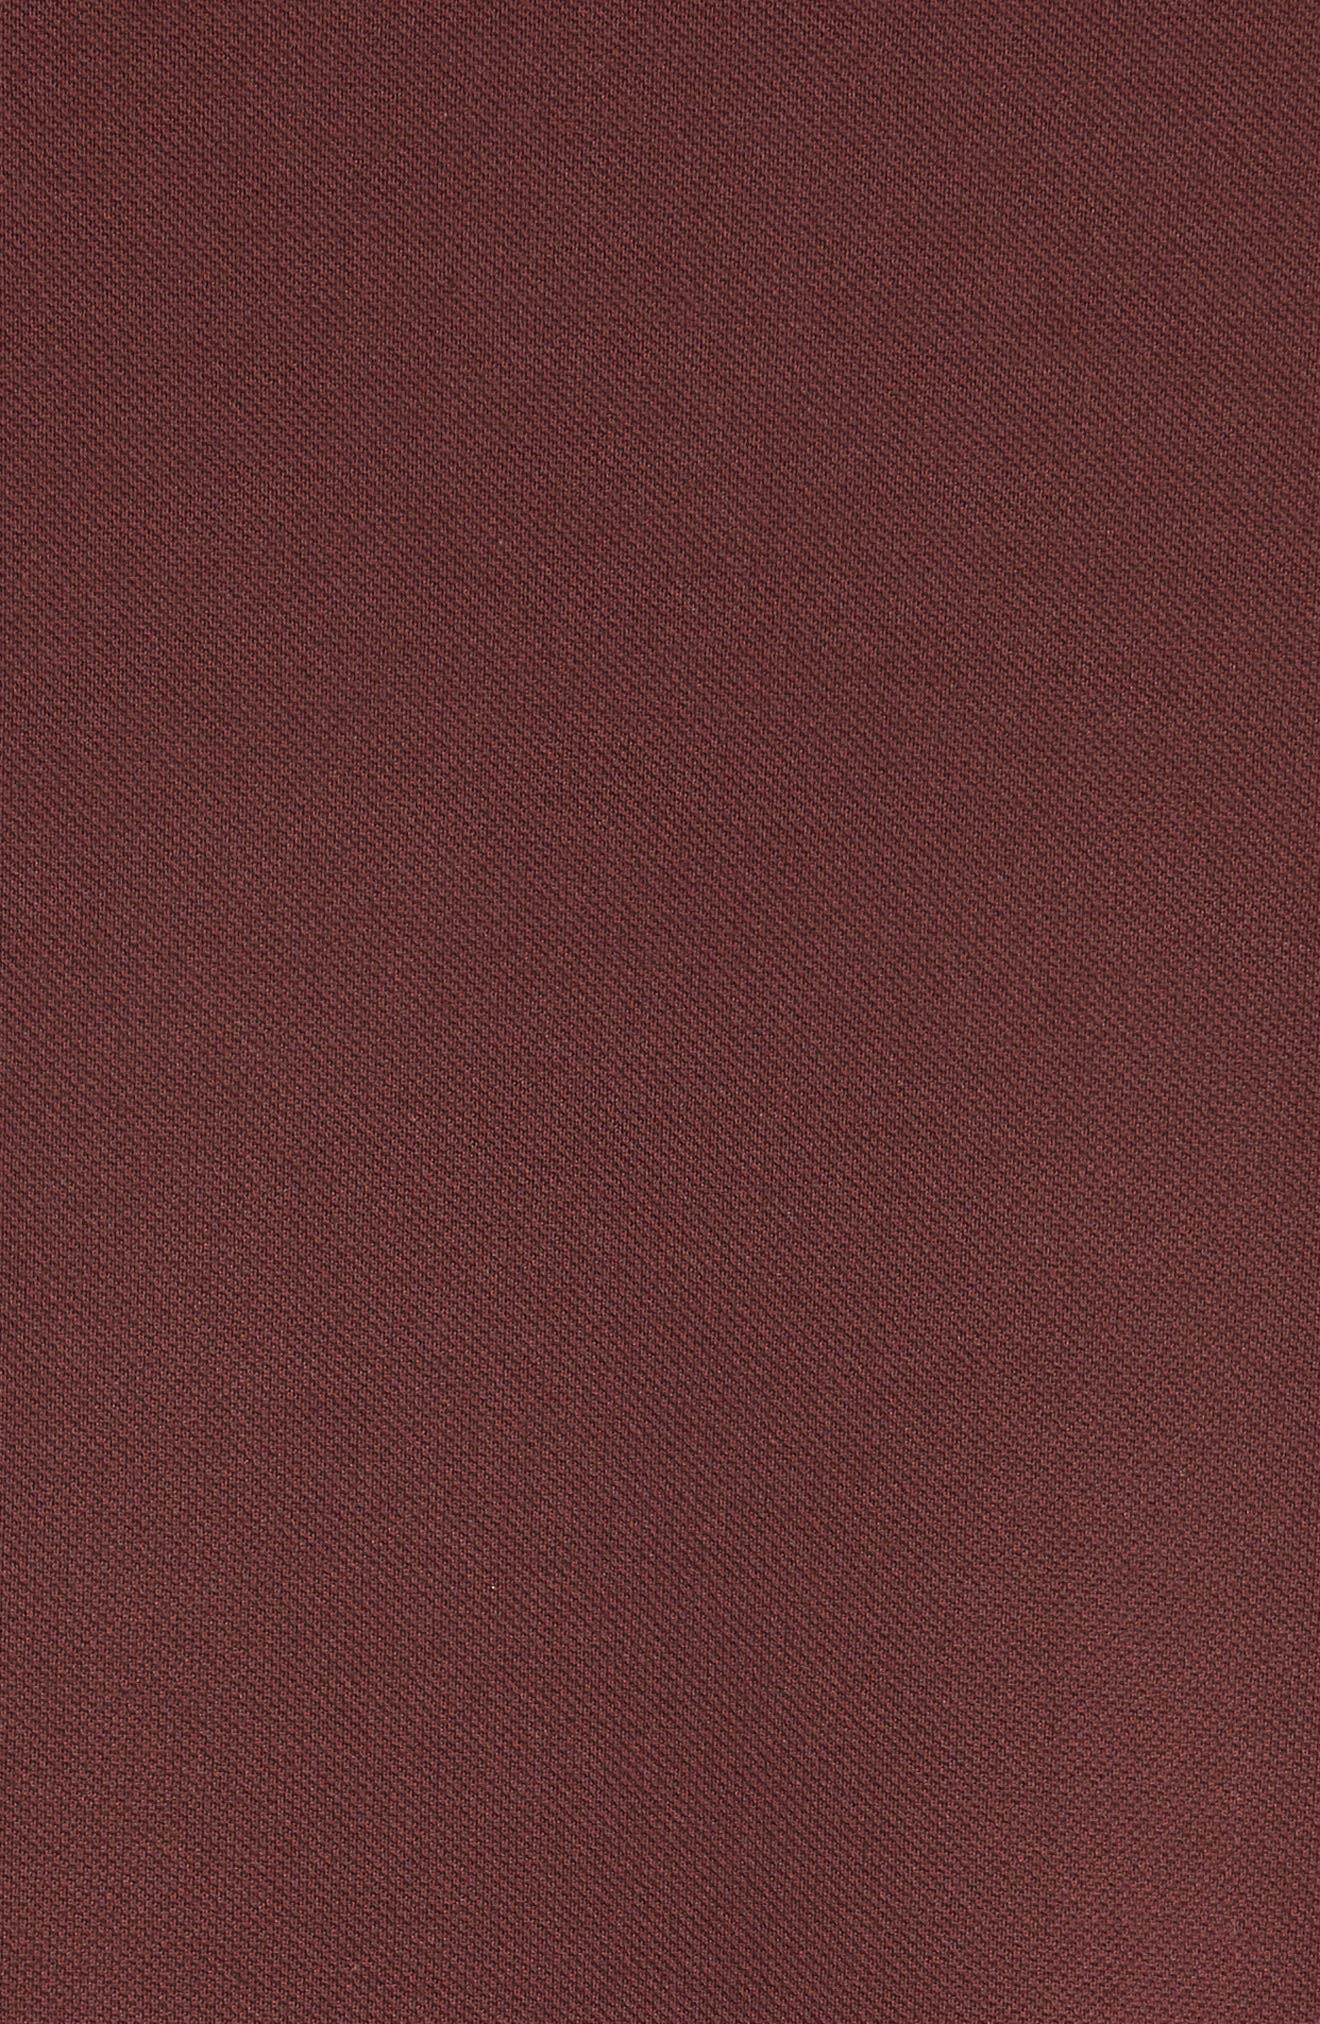 Bat Crest Polo,                             Alternate thumbnail 5, color,                             Burgundy